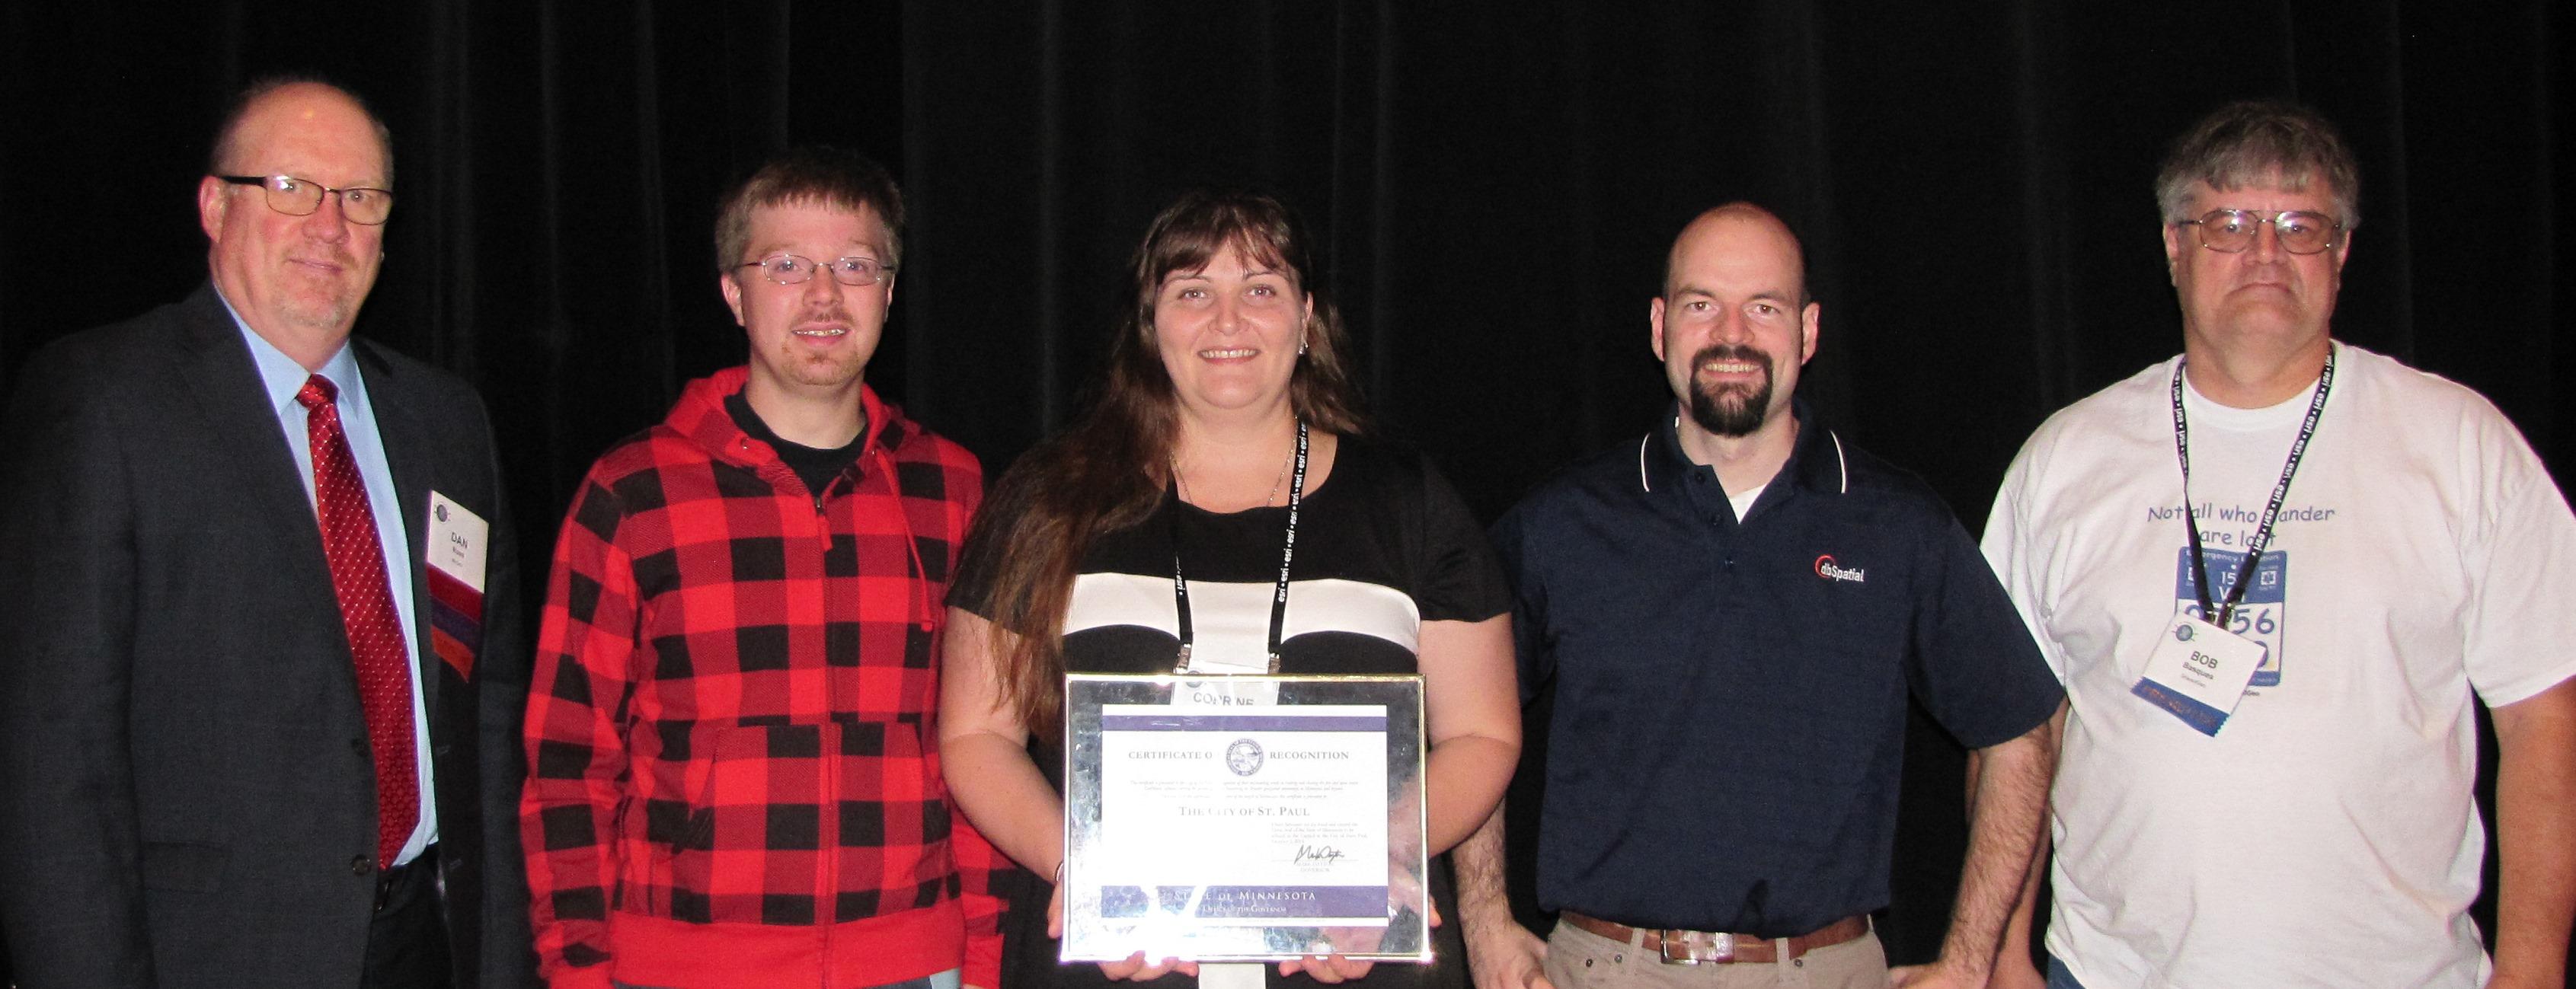 2013 MN Governors award photo